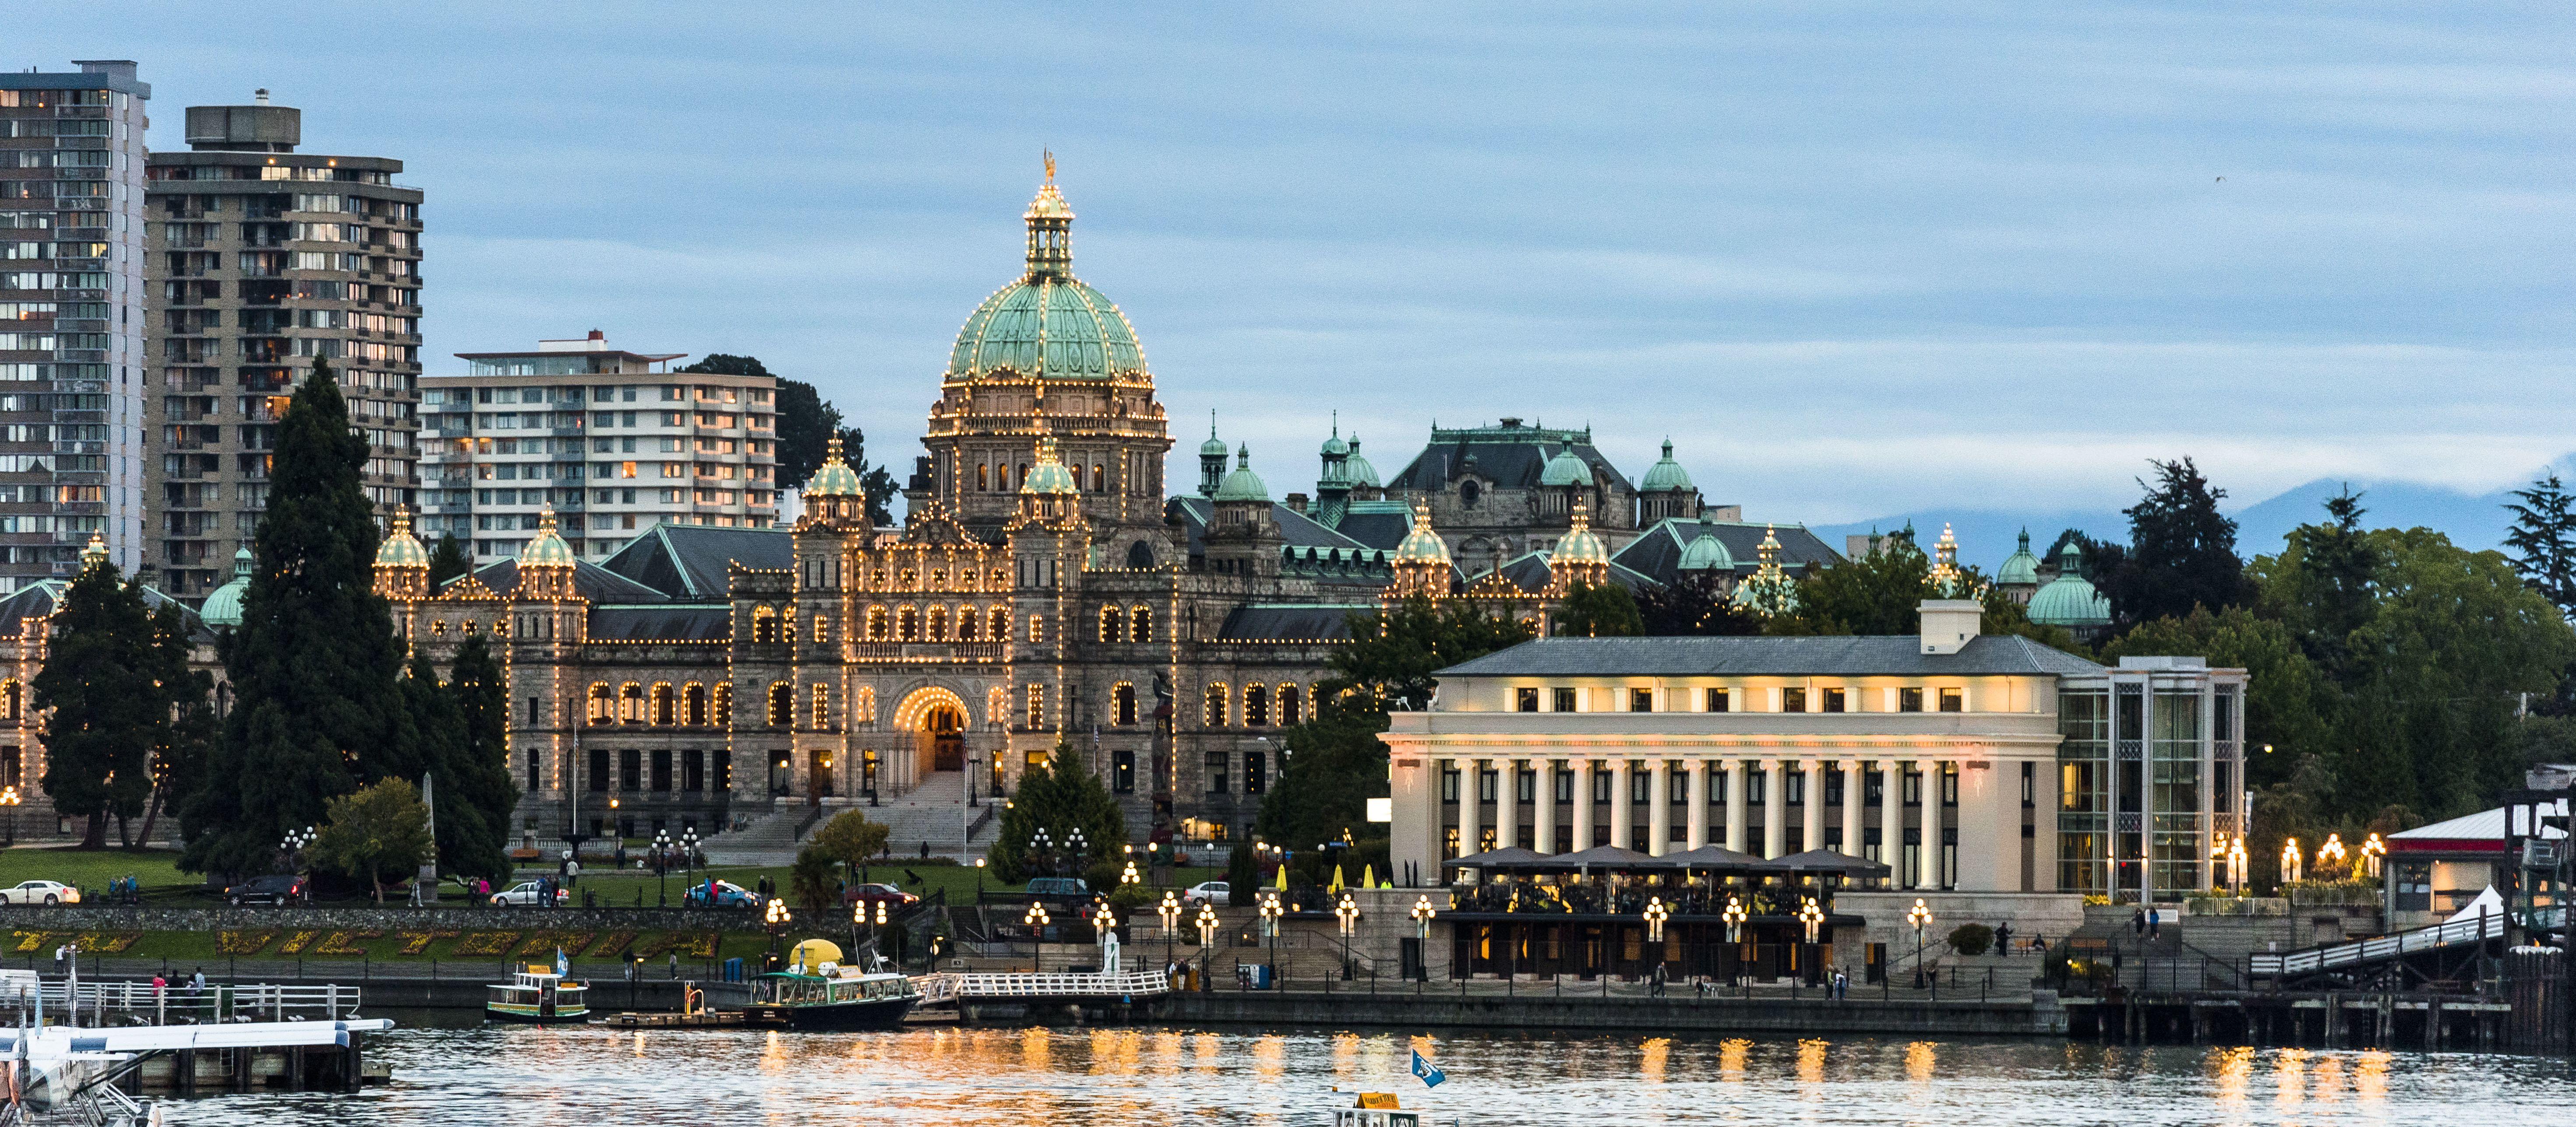 Parlamentsgebäude in Victoria auf Vancouver Island, British Columbia